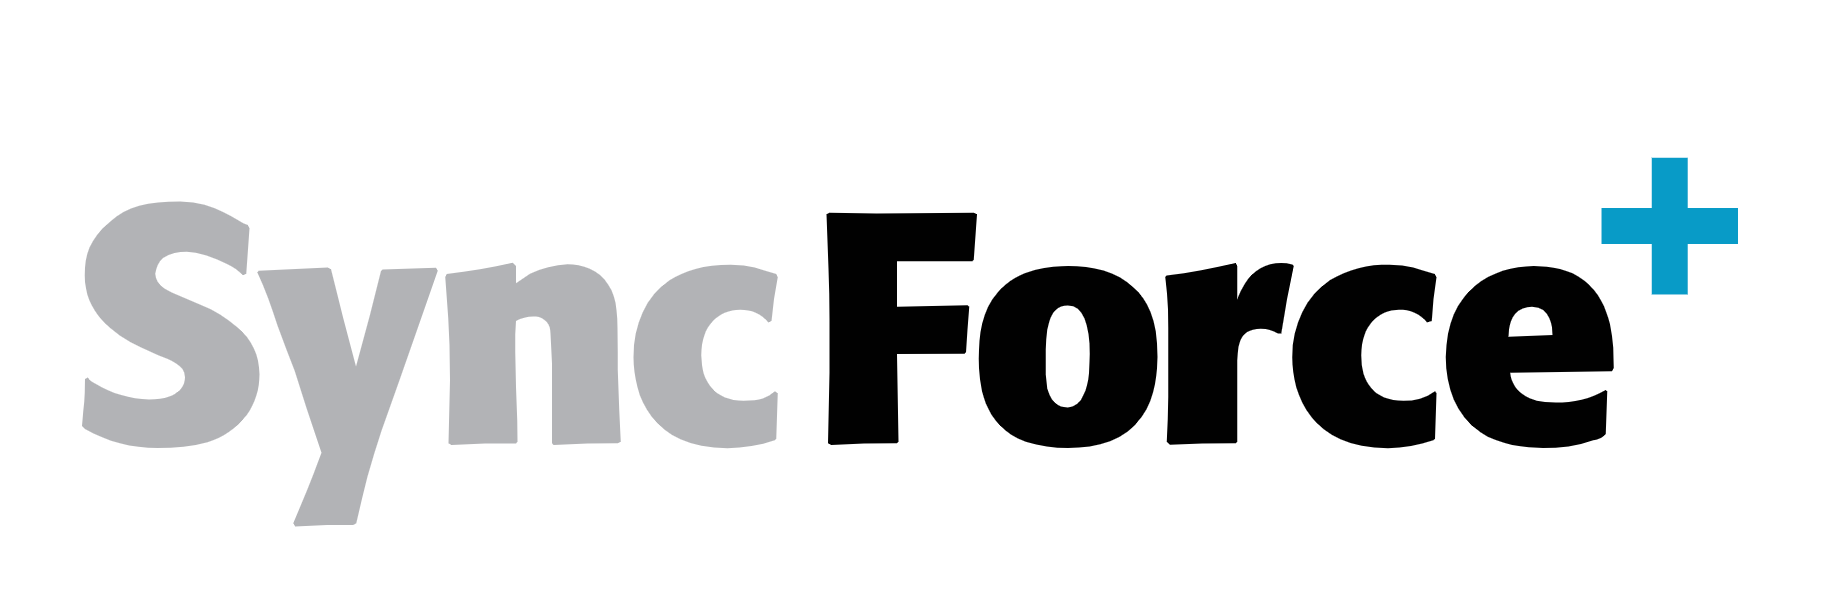 SyncForce logo